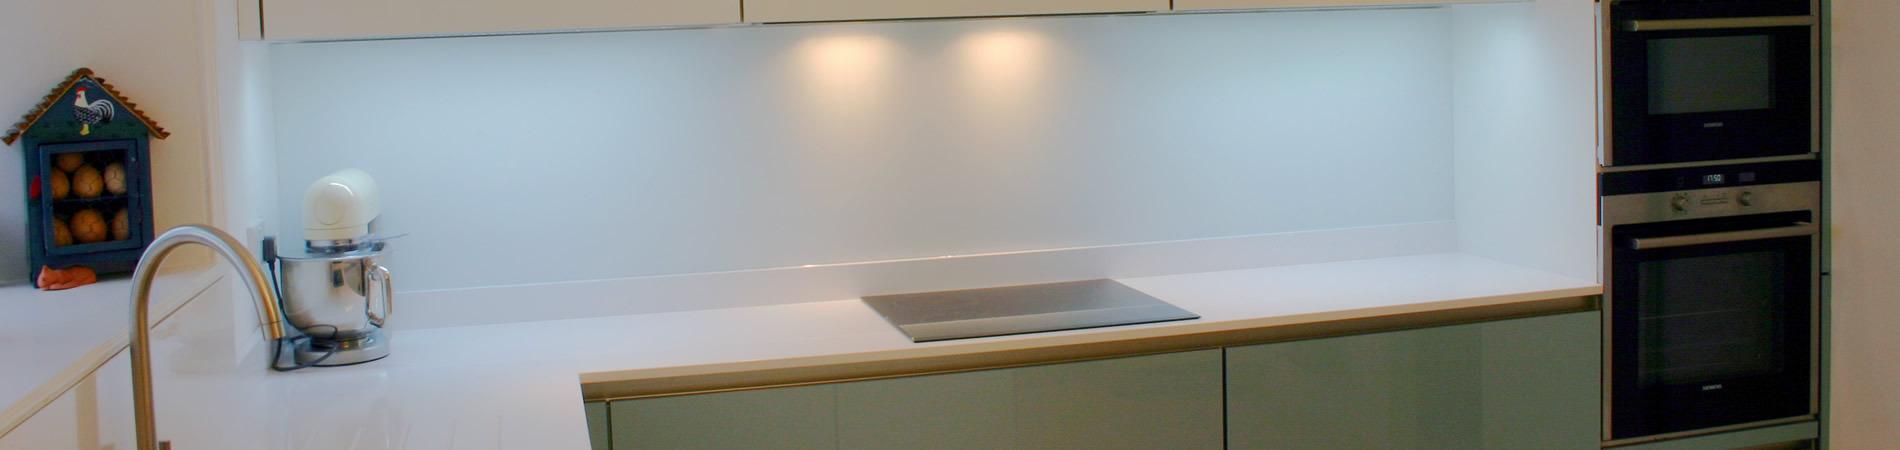 Full Size of Glaswand Küche Kosten Glaswand Küche Reinigen Glaswand Küche Spritzschutz Glaswand Küche Beleuchtet Küche Glaswand Küche